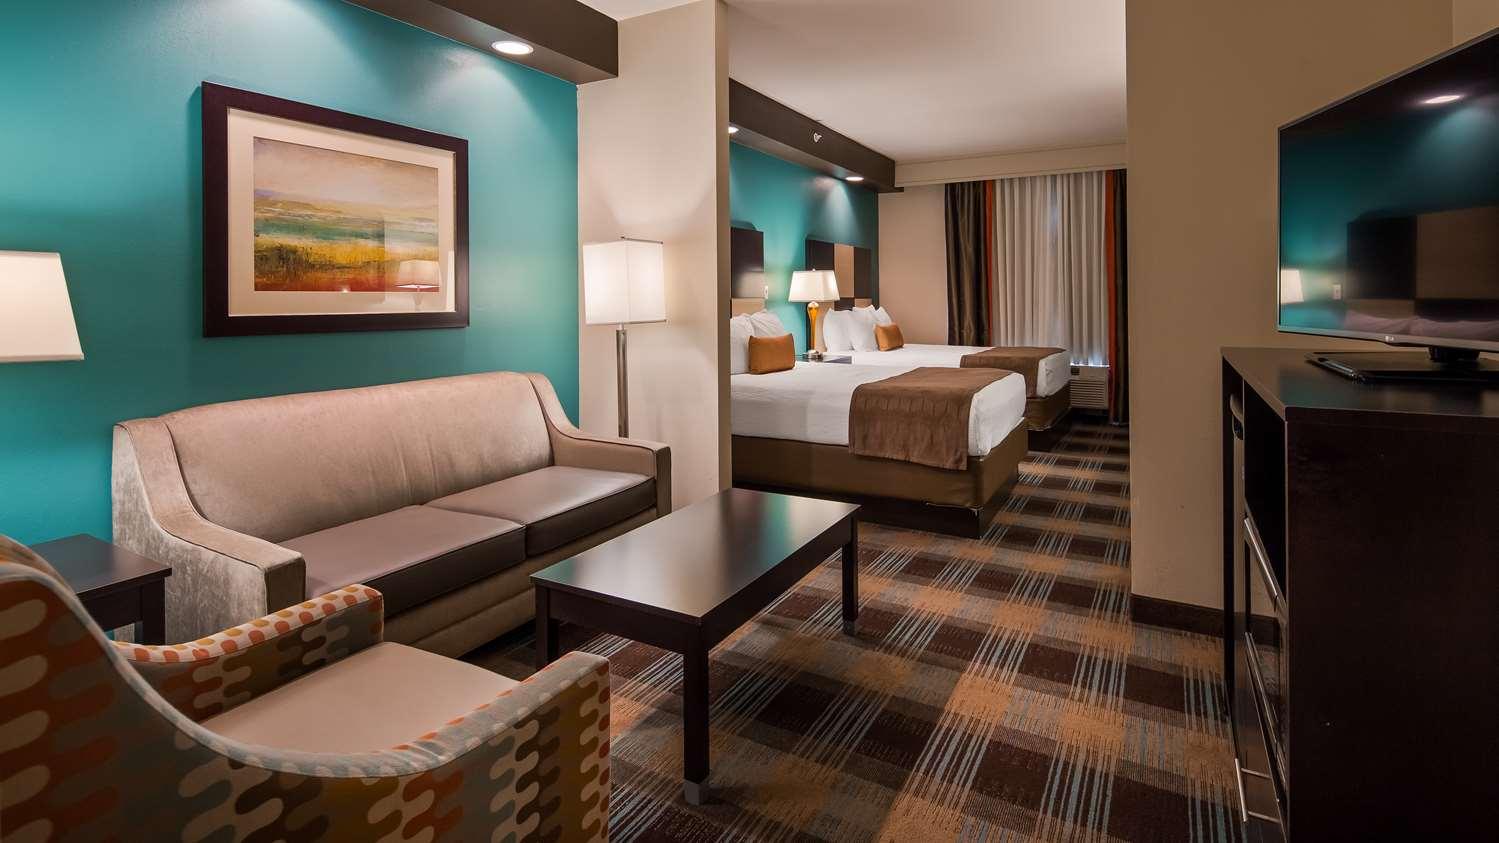 Best Western Plus Atrium Inn & Suites Clarksville, TN - See Discounts